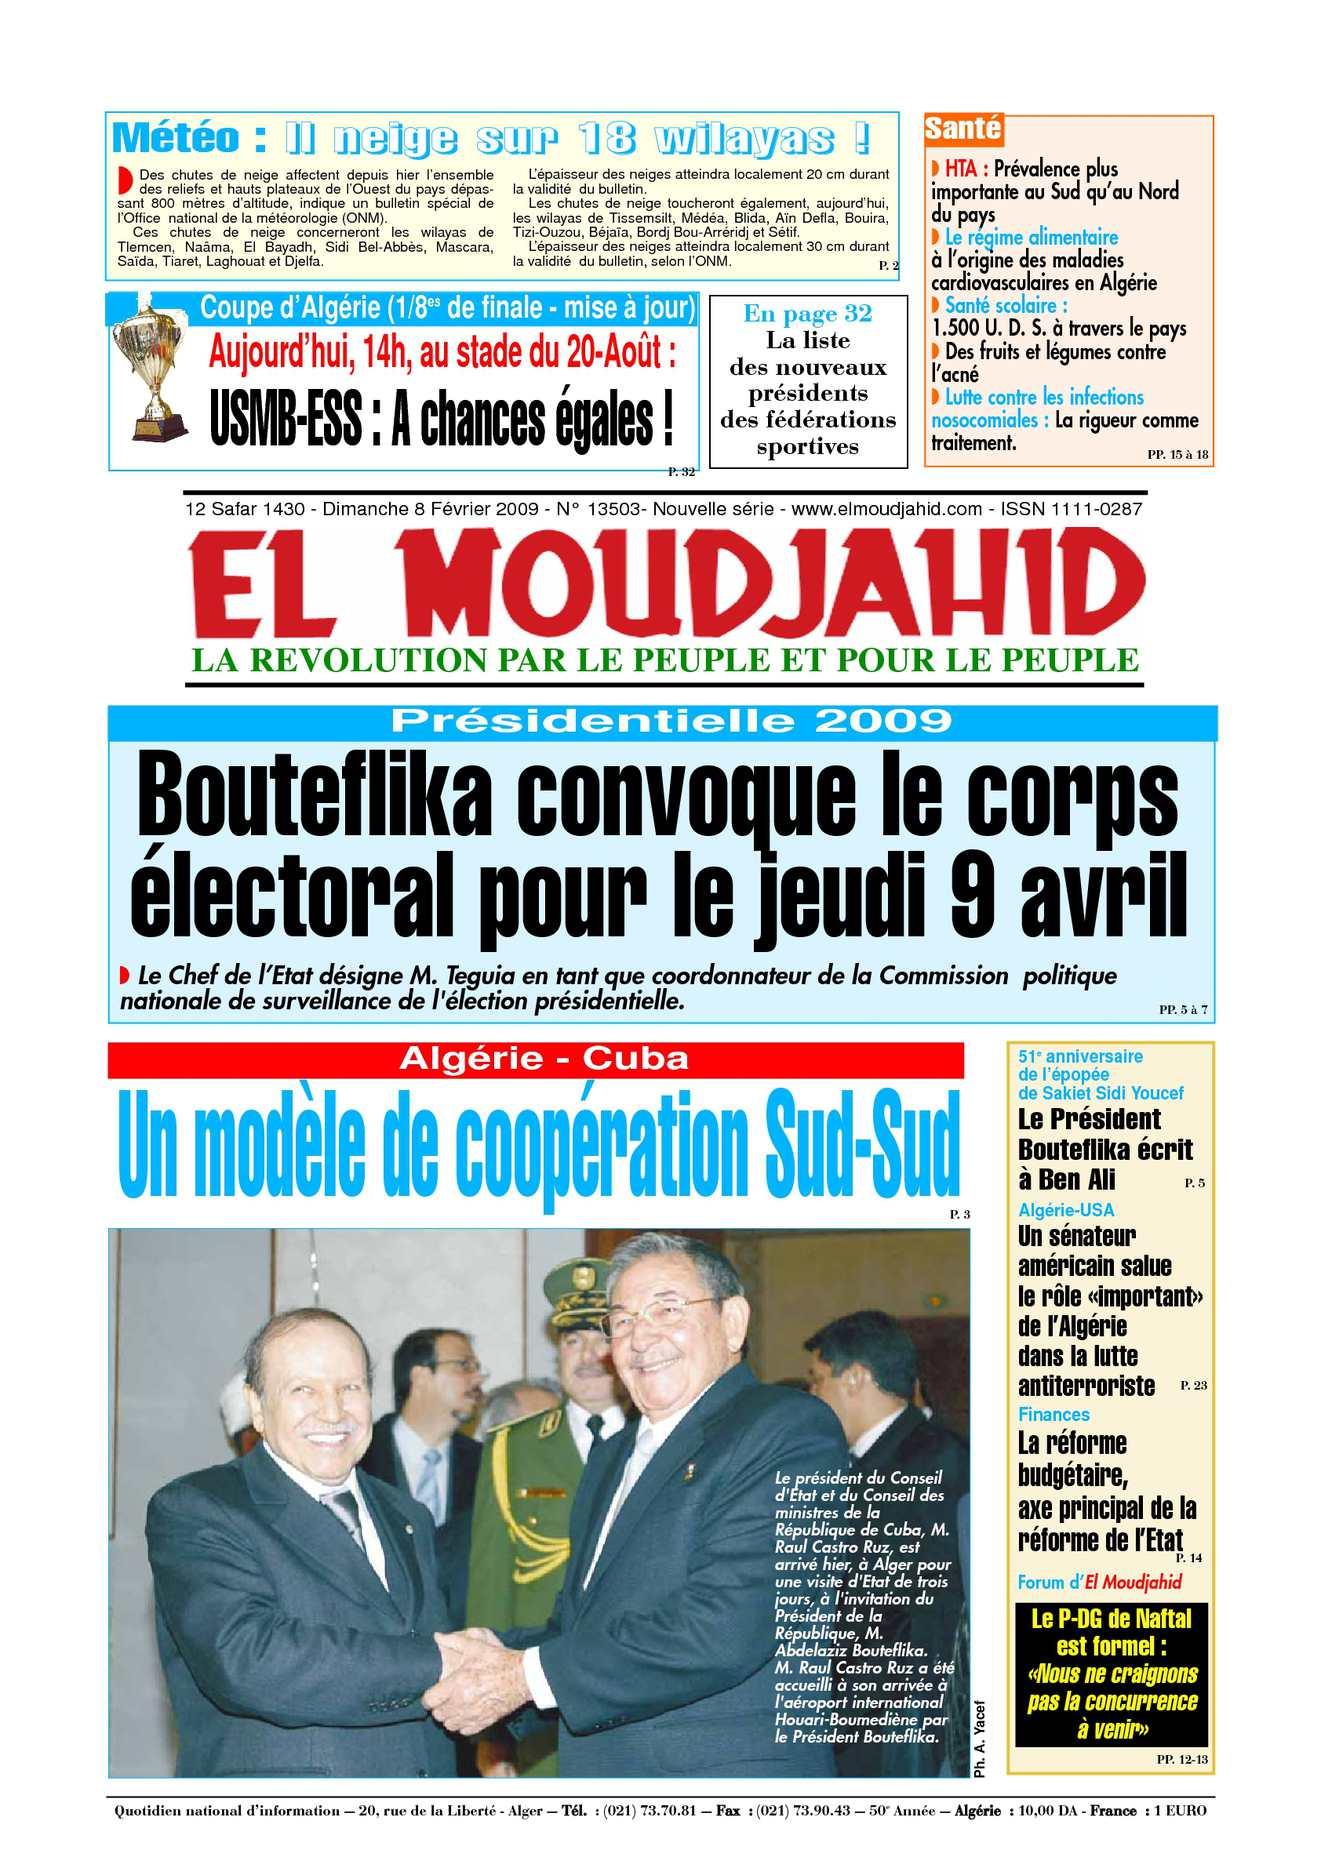 EL Moudjahid_08-02-2009